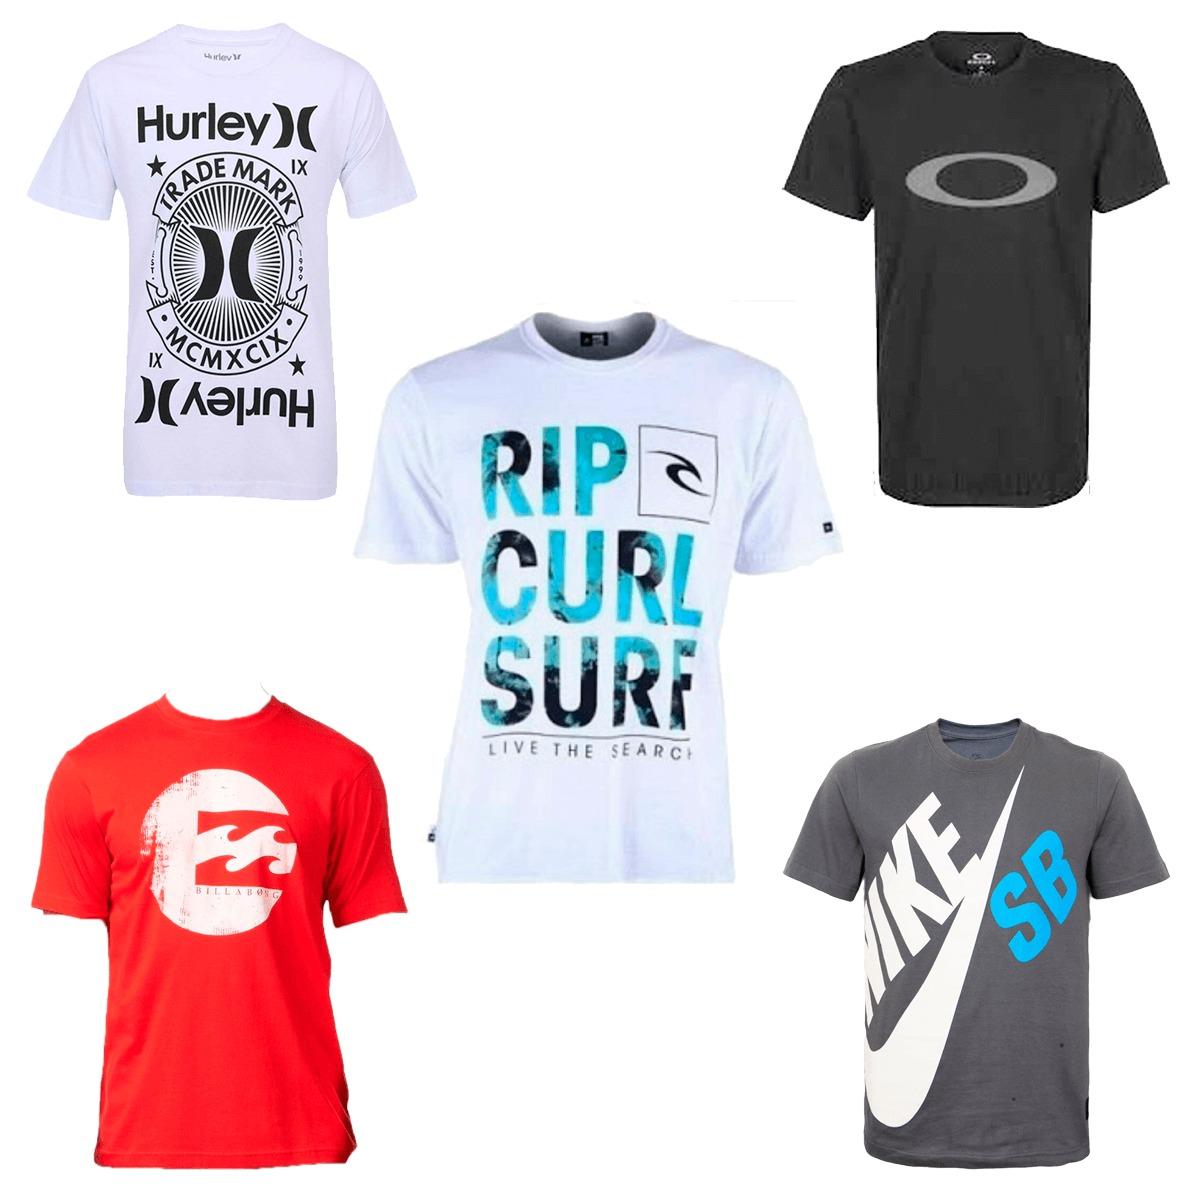 776b4674cddd3 Kit 10 Camisa Camiseta Masculina Marca Estampada Top - R$ 179,90 em ...